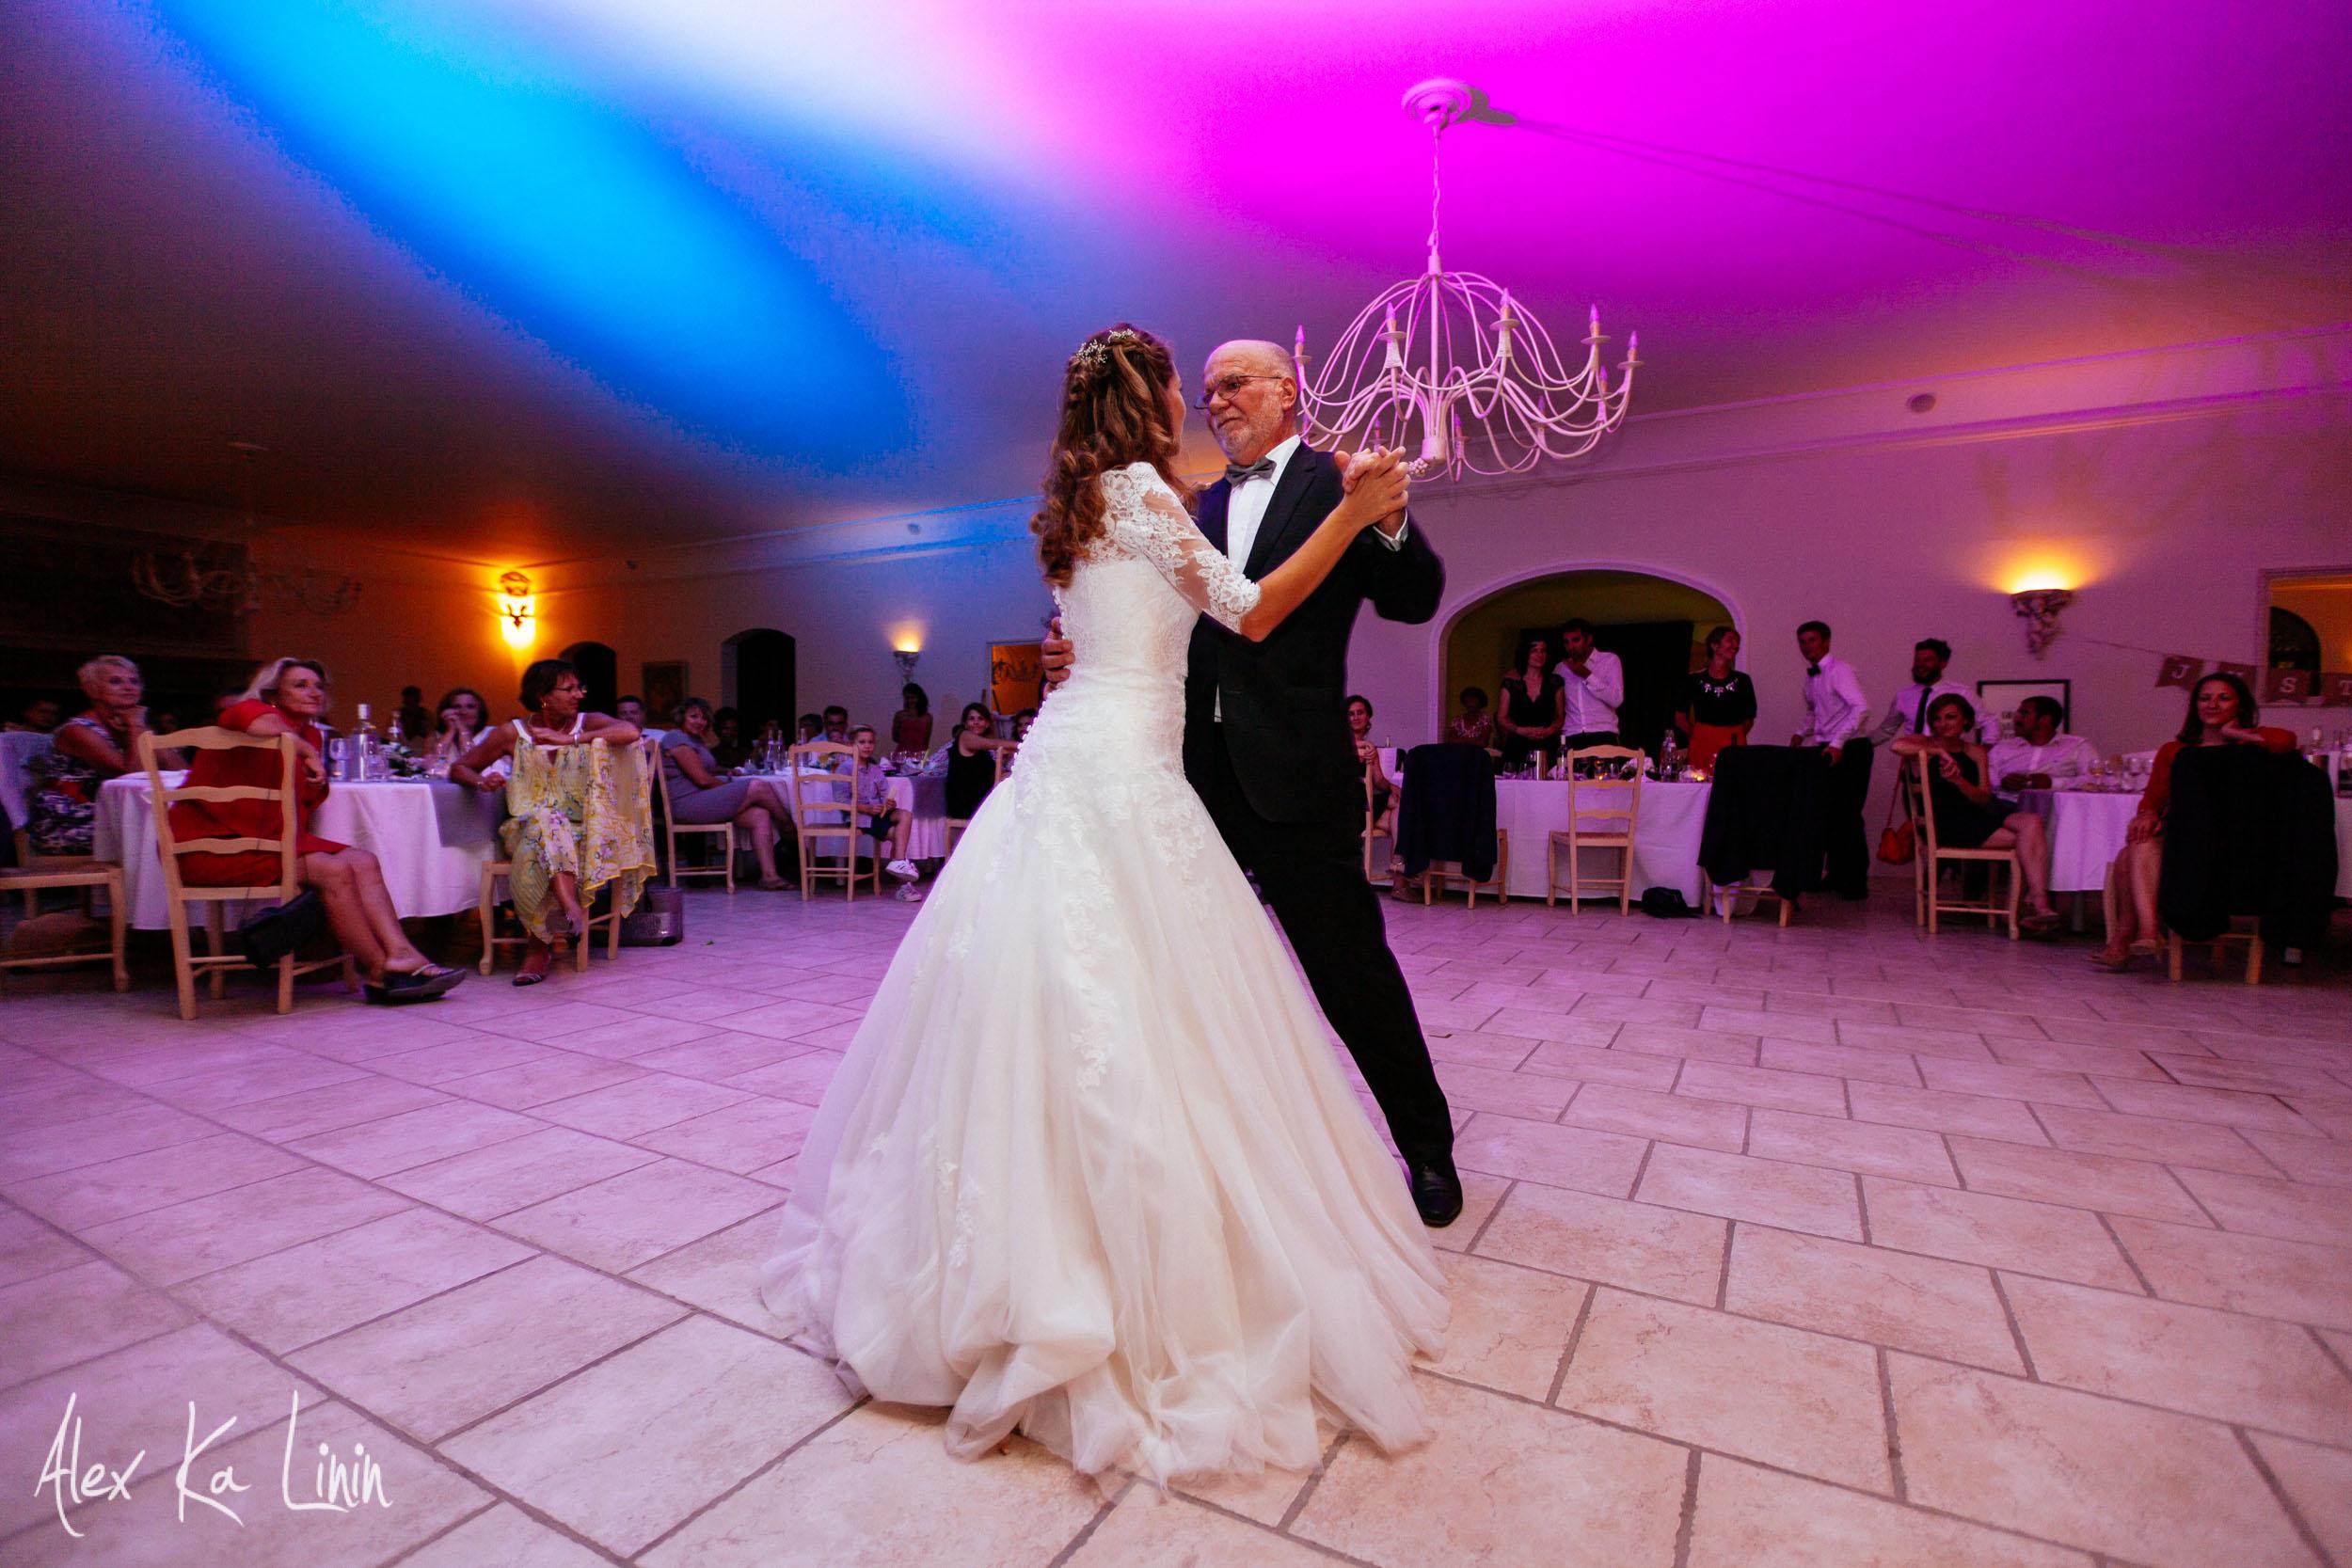 AlexKa_wedding_mariage_photographer-51.jpg